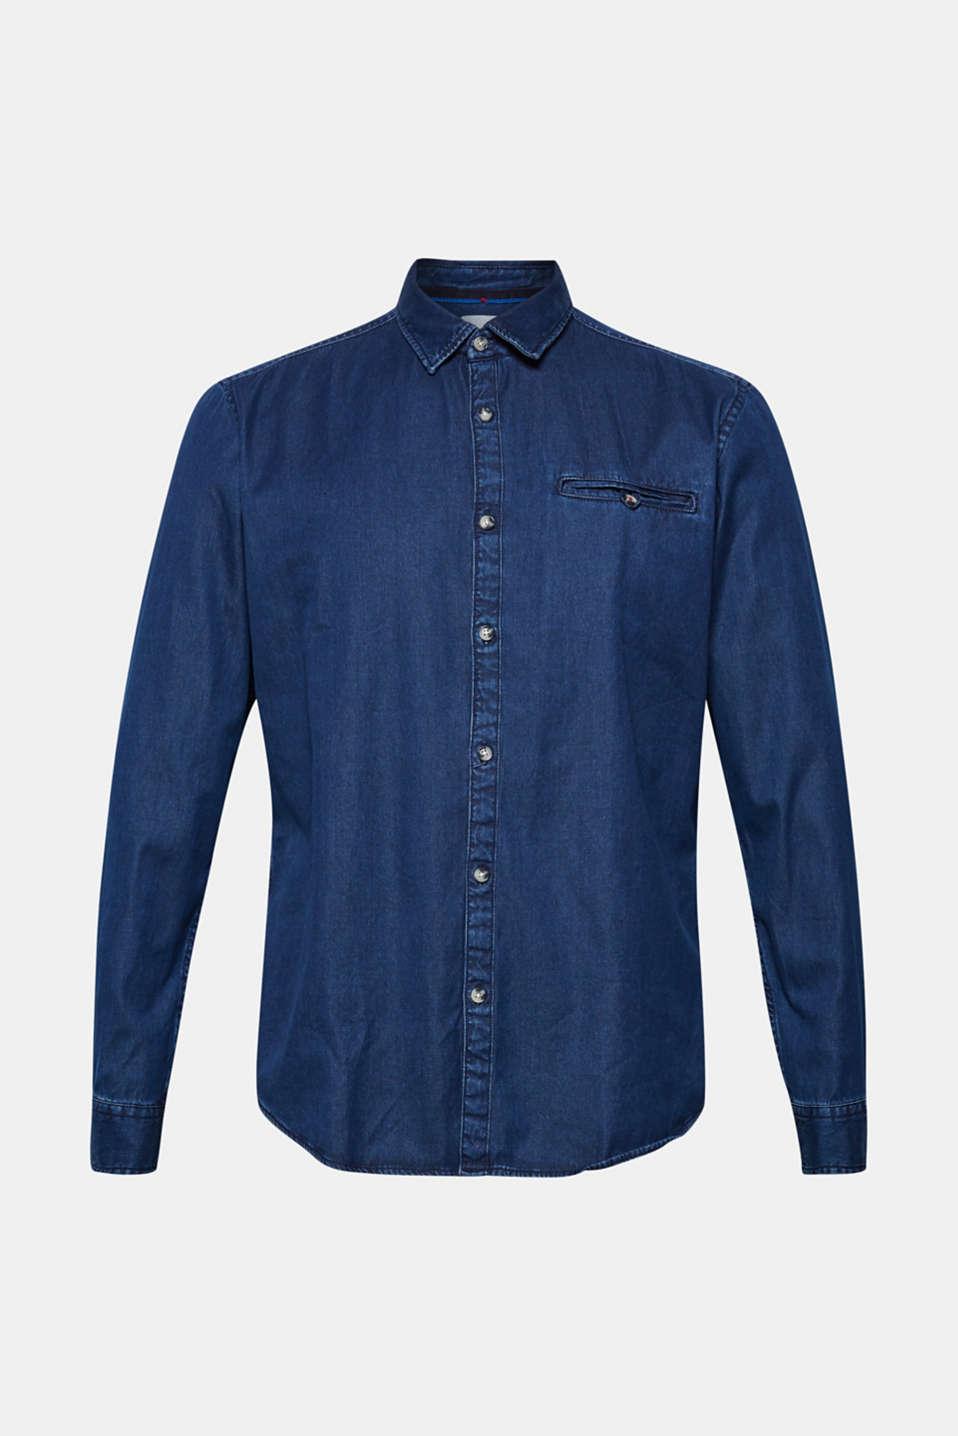 Denim shirt in 100% cotton, BLUE MEDIUM WASH, detail image number 6